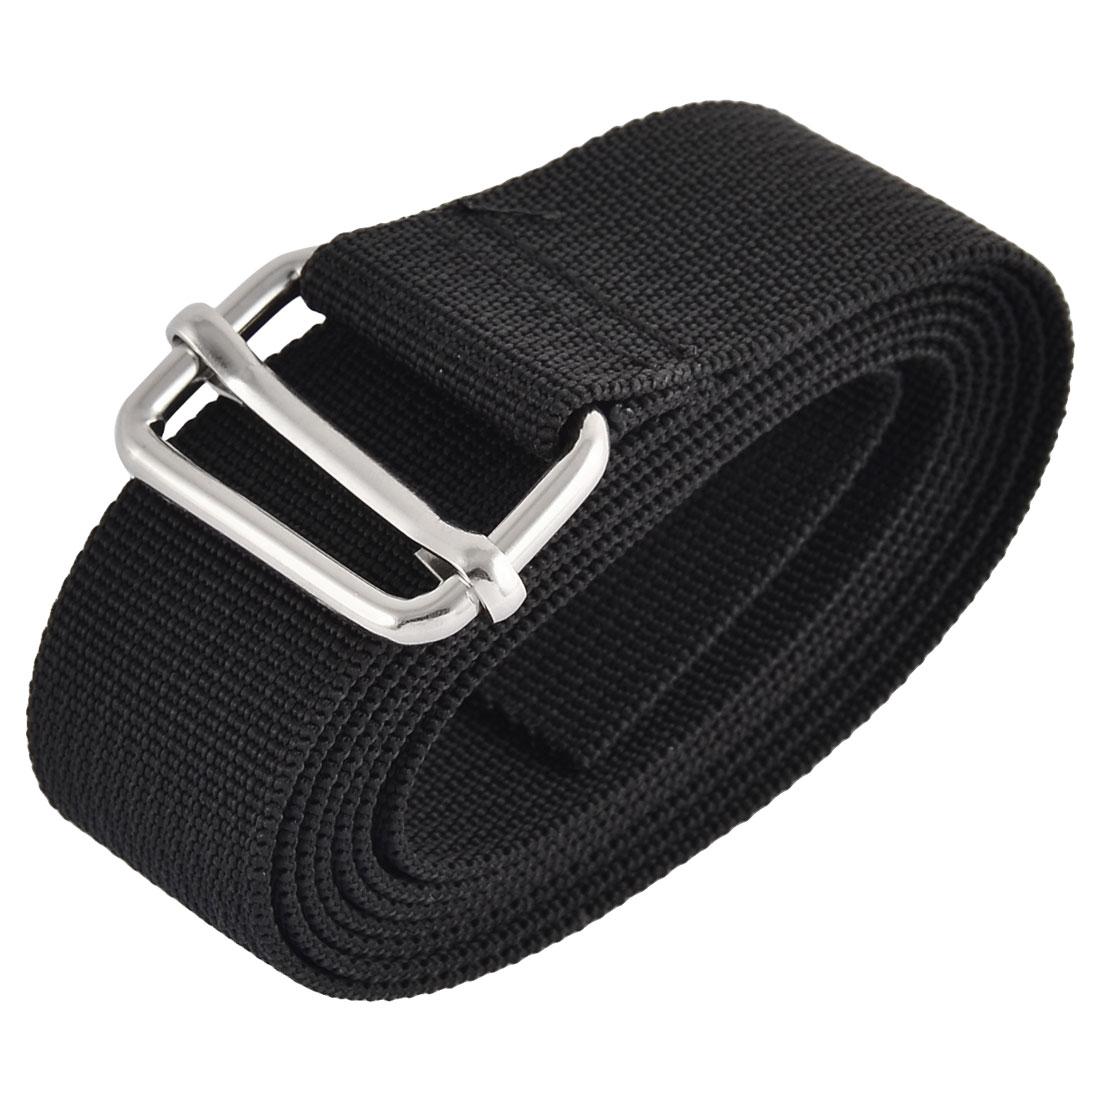 Household Travel Nylon Adjustable Suitcase Luggage Strap Belt Buckle Black 1.5M Length